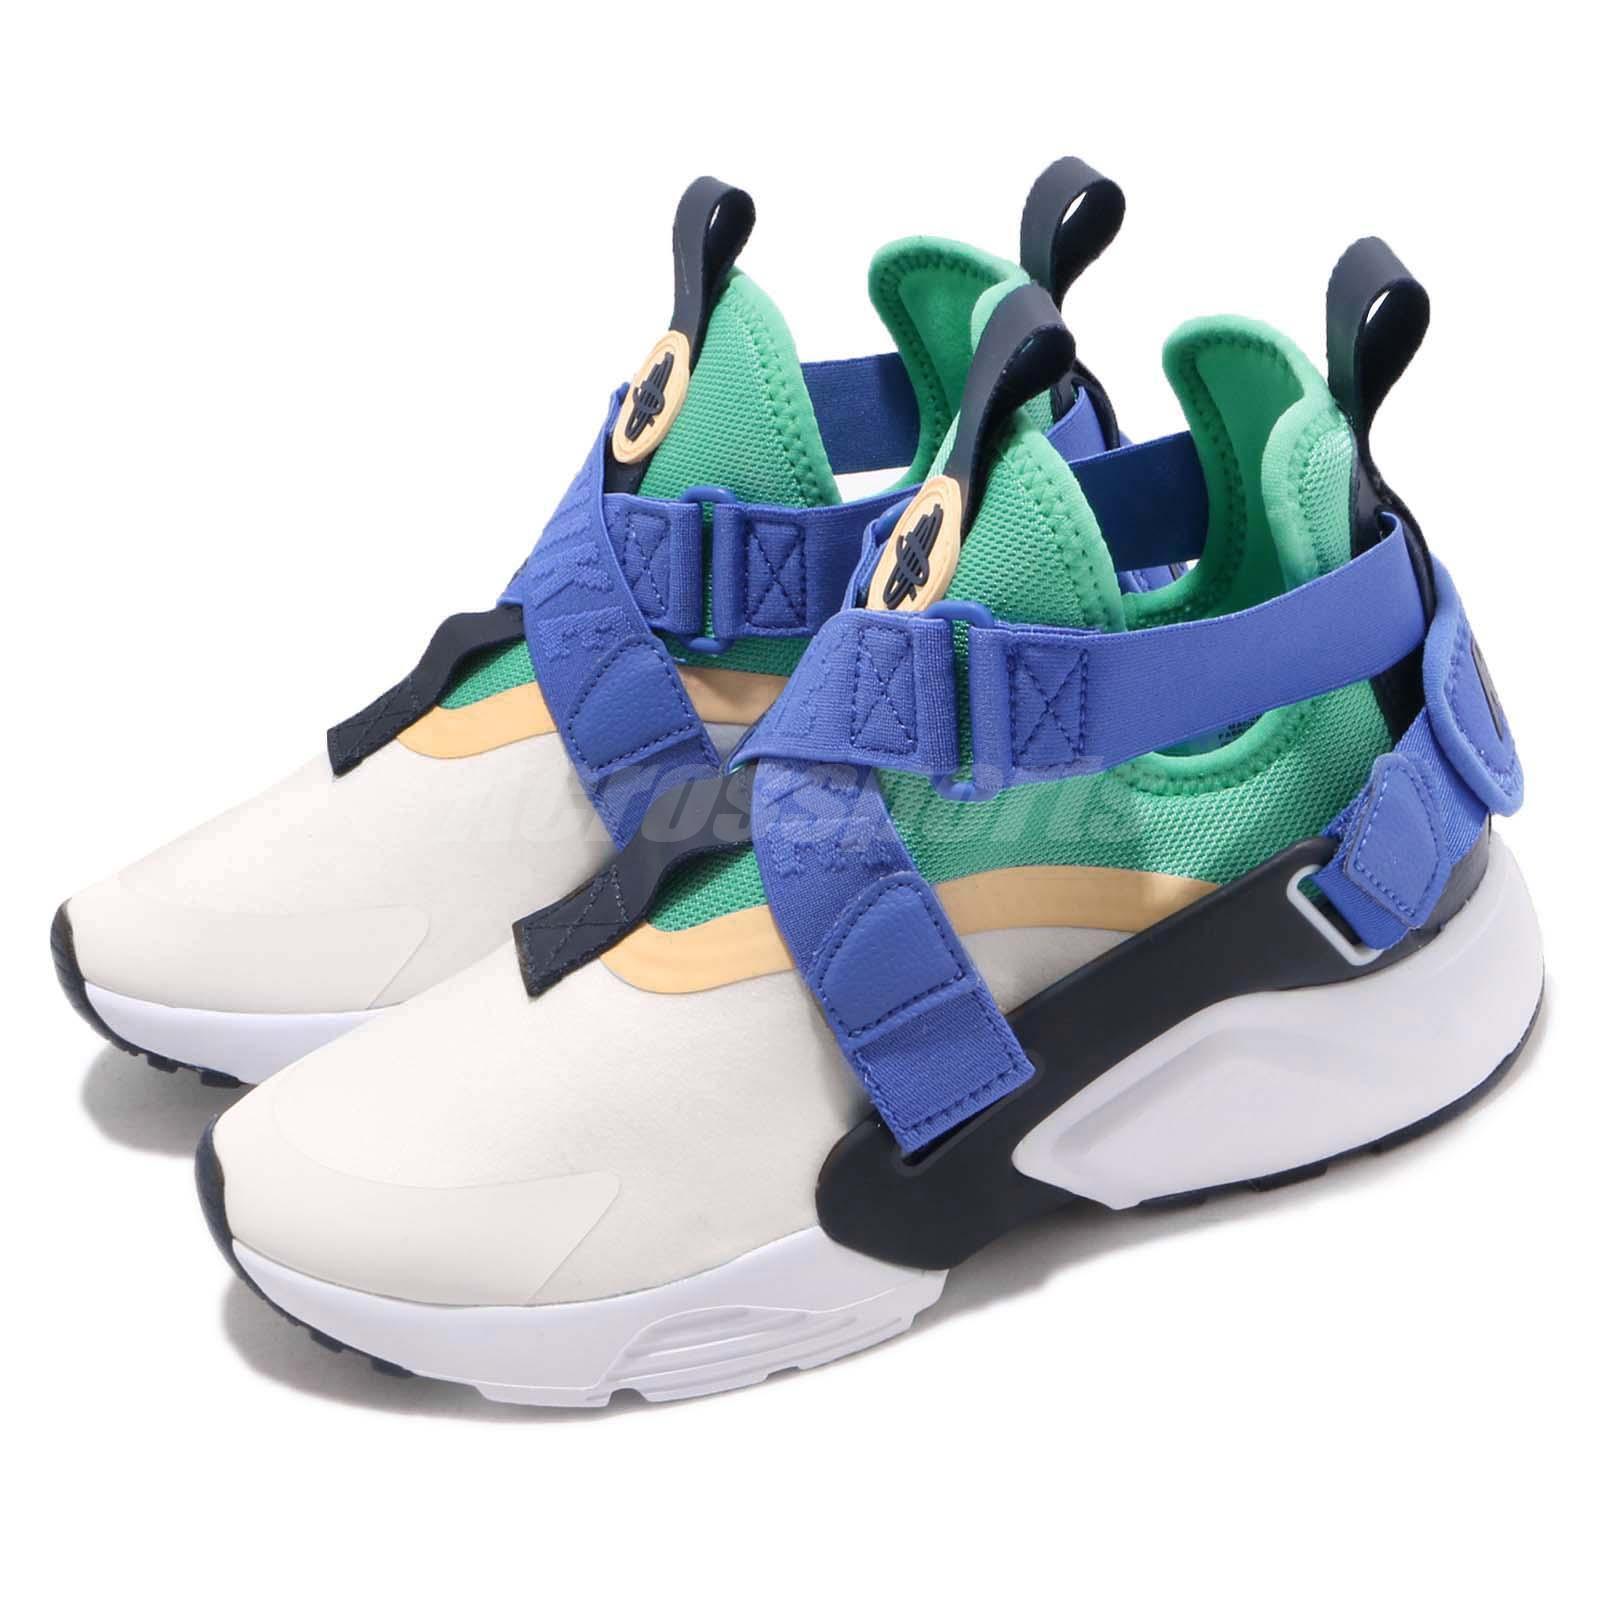 Wmns nike air huarache città città città delle donne di scegliere le scarpe da ginnastica streetwear 1 | Ha una lunga reputazione  | Maschio/Ragazze Scarpa  4641b8